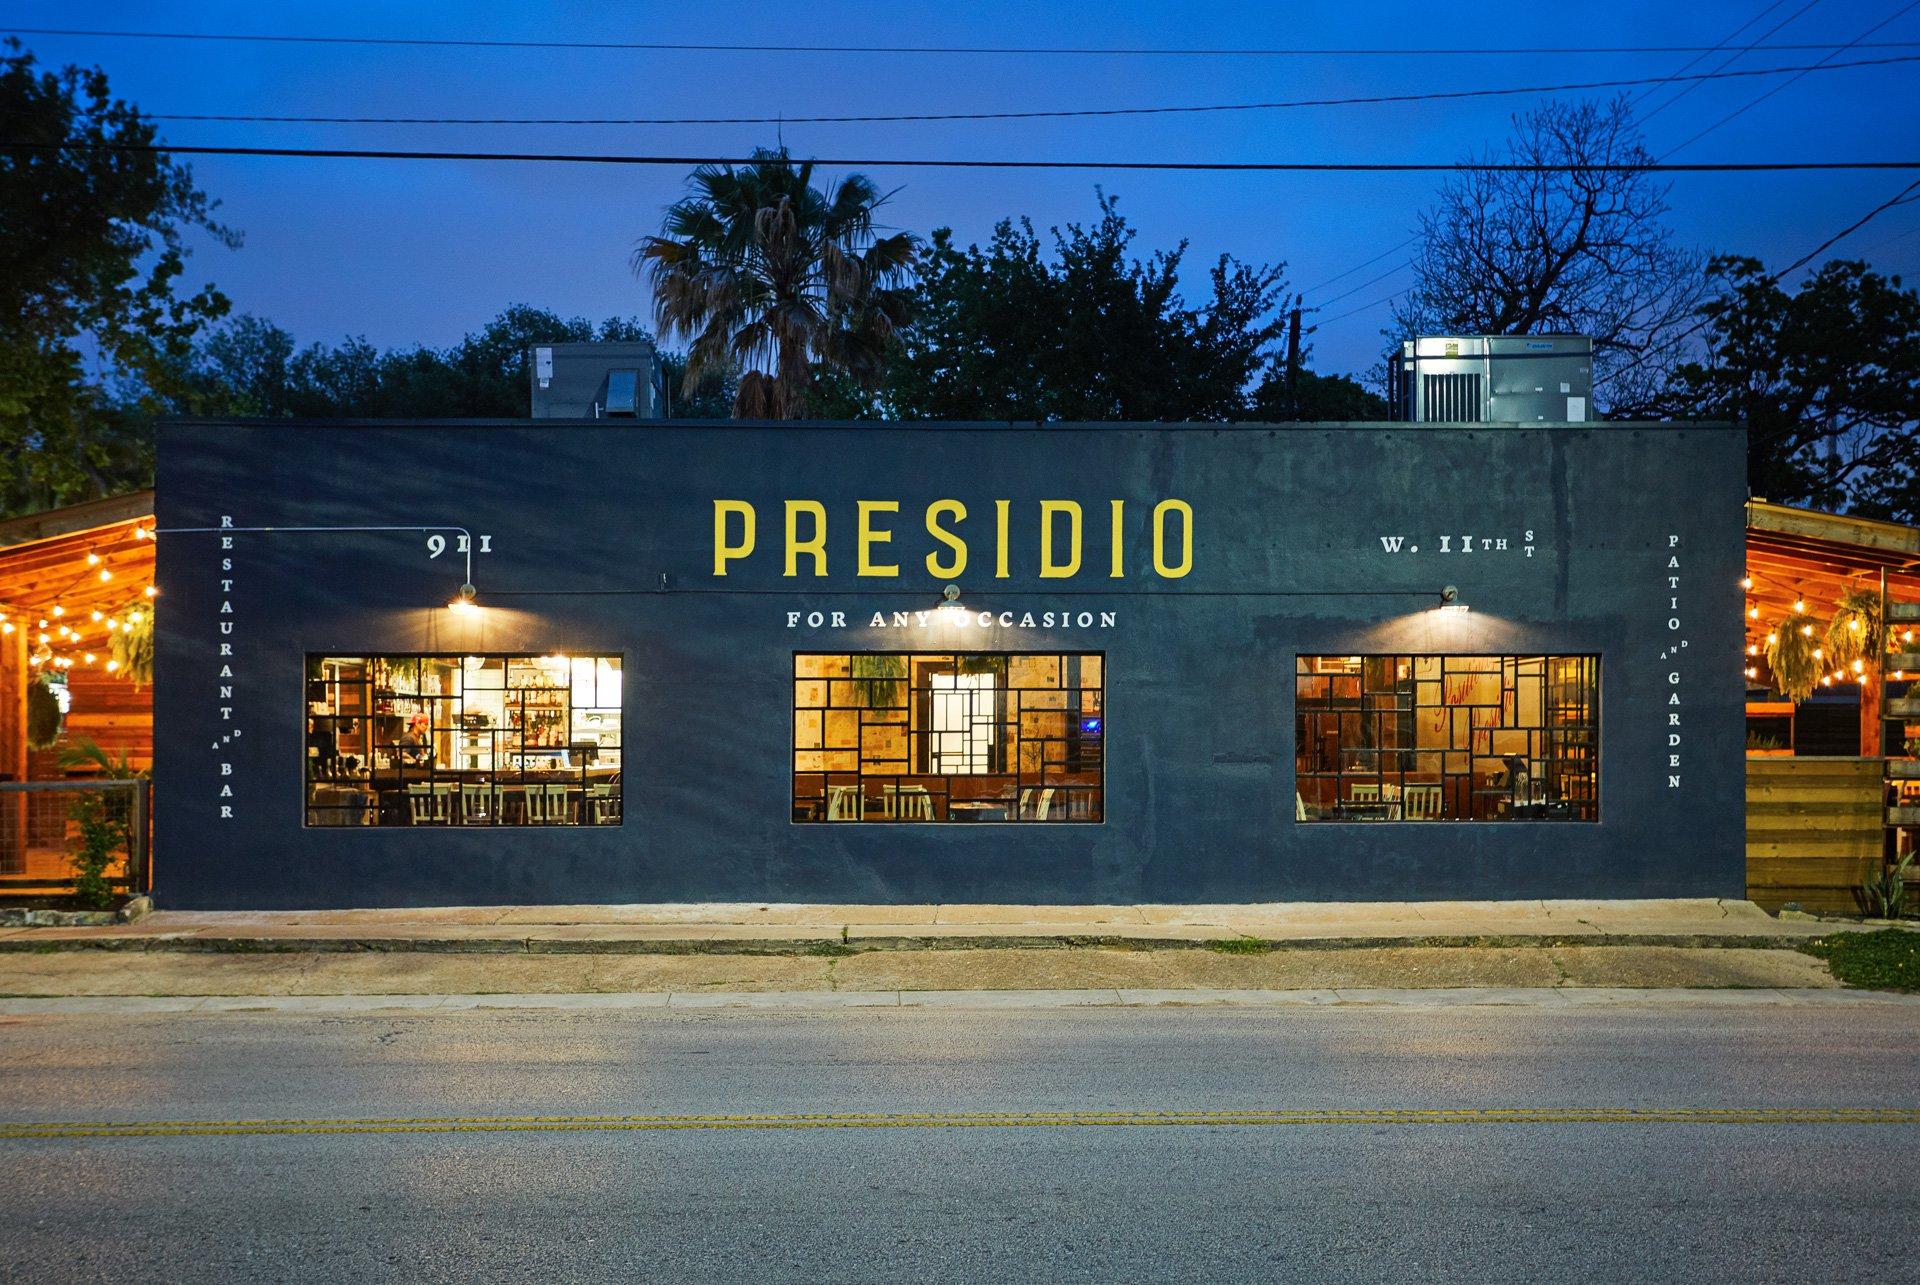 Presidio Exterior Restaurant Photo